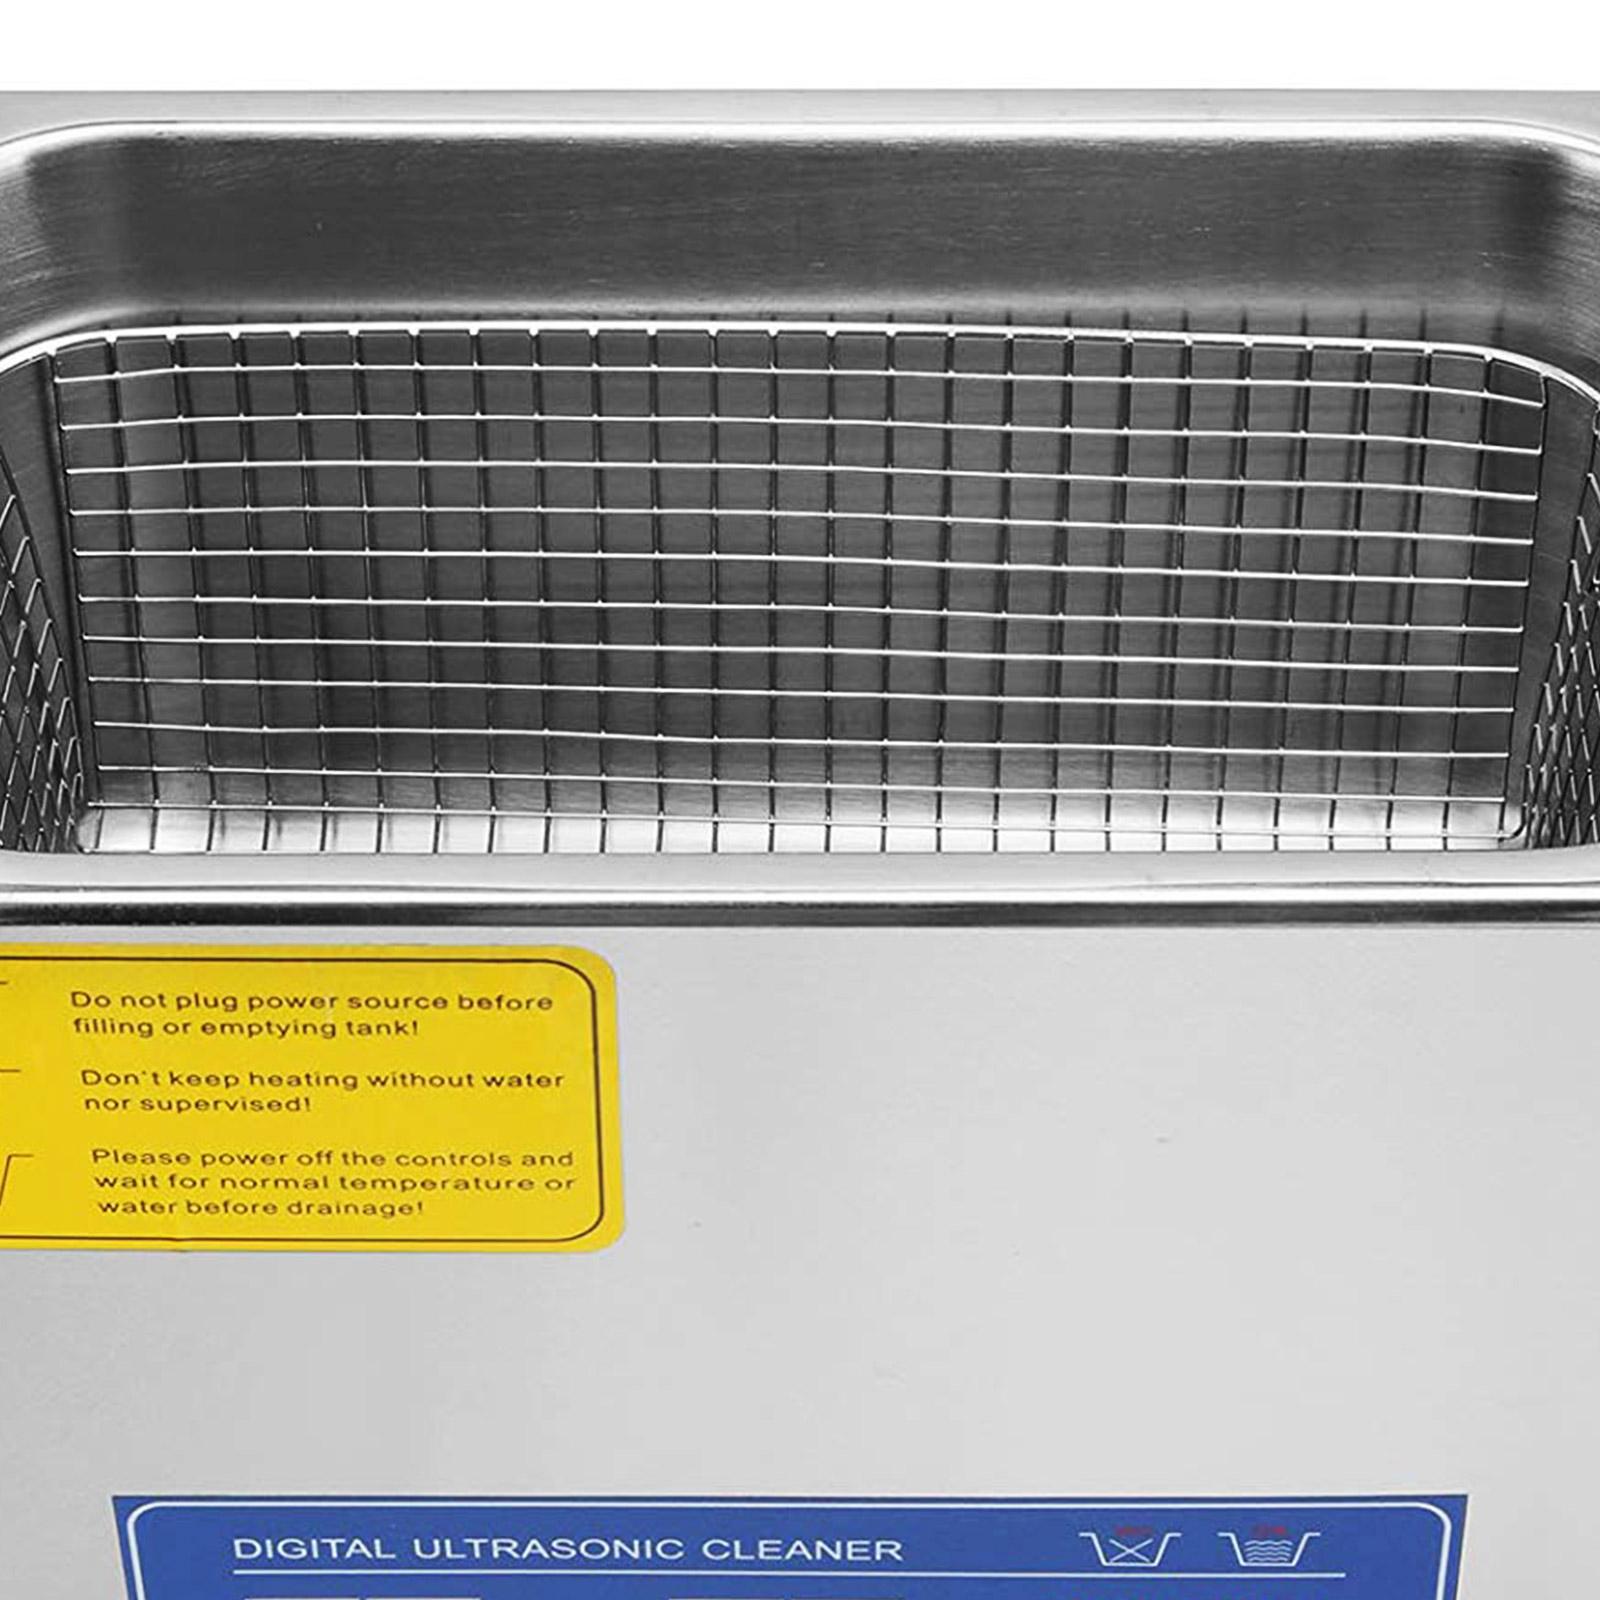 Vaschetta-Vasca-Ultrasuoni-Lavatrice-Pulitore-Ad-Ultrasuoni miniatura 79